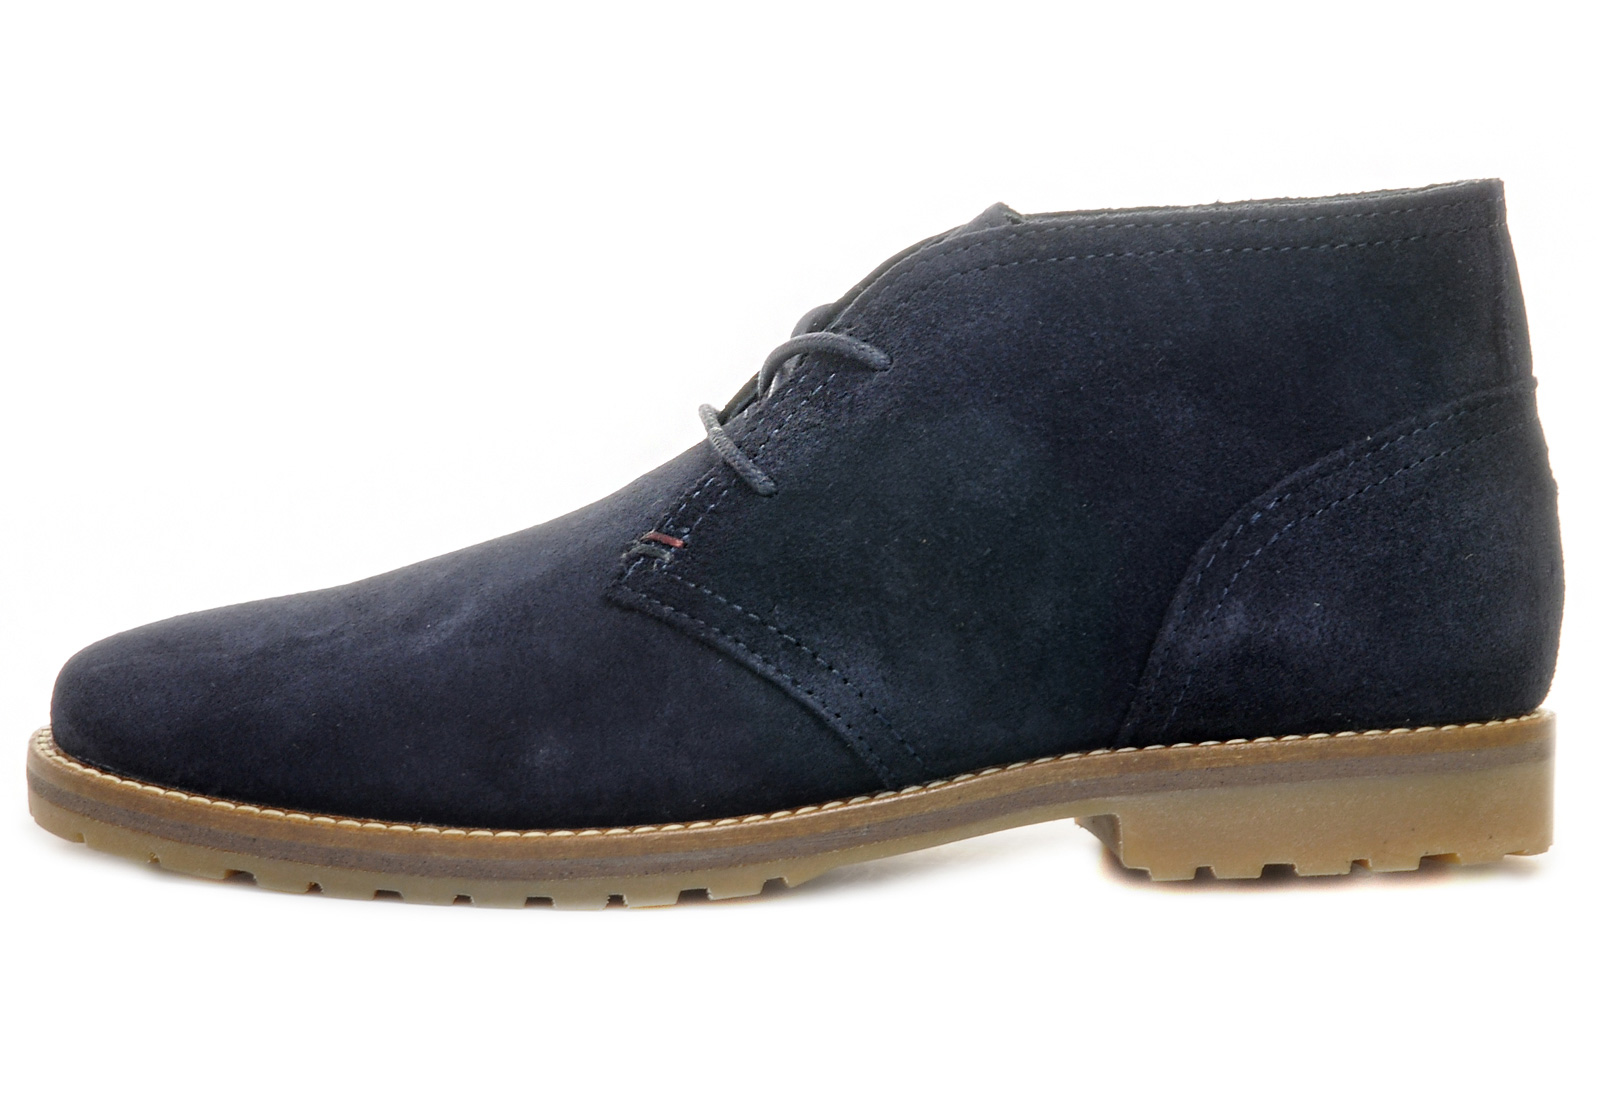 Tommy Hilfiger Shoes Wera 1 b 13f 6055 403 Online shop